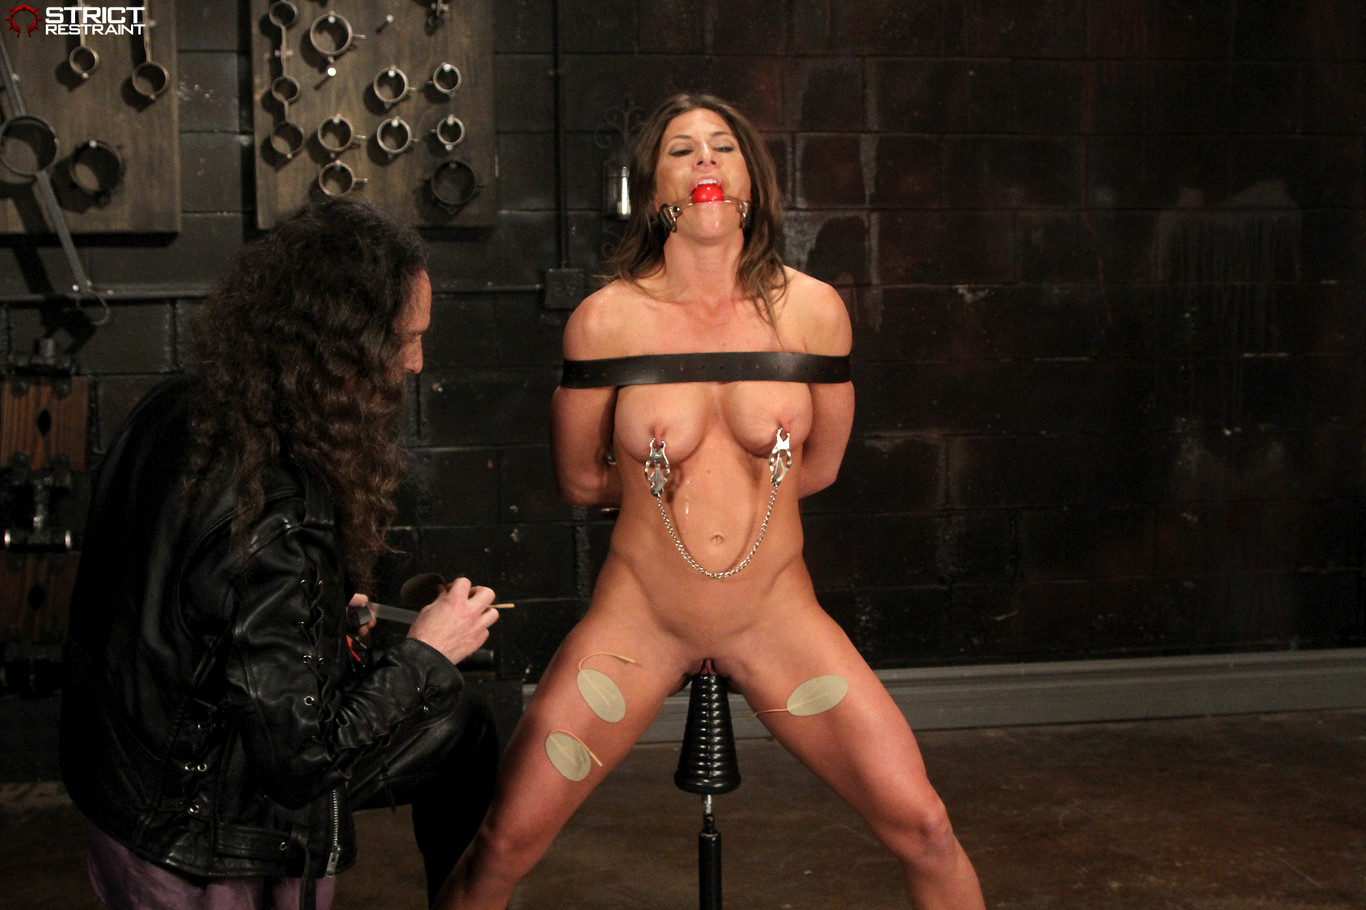 Babe Today Strict Restraint Ariel X Natural Bdsm Sex -4641